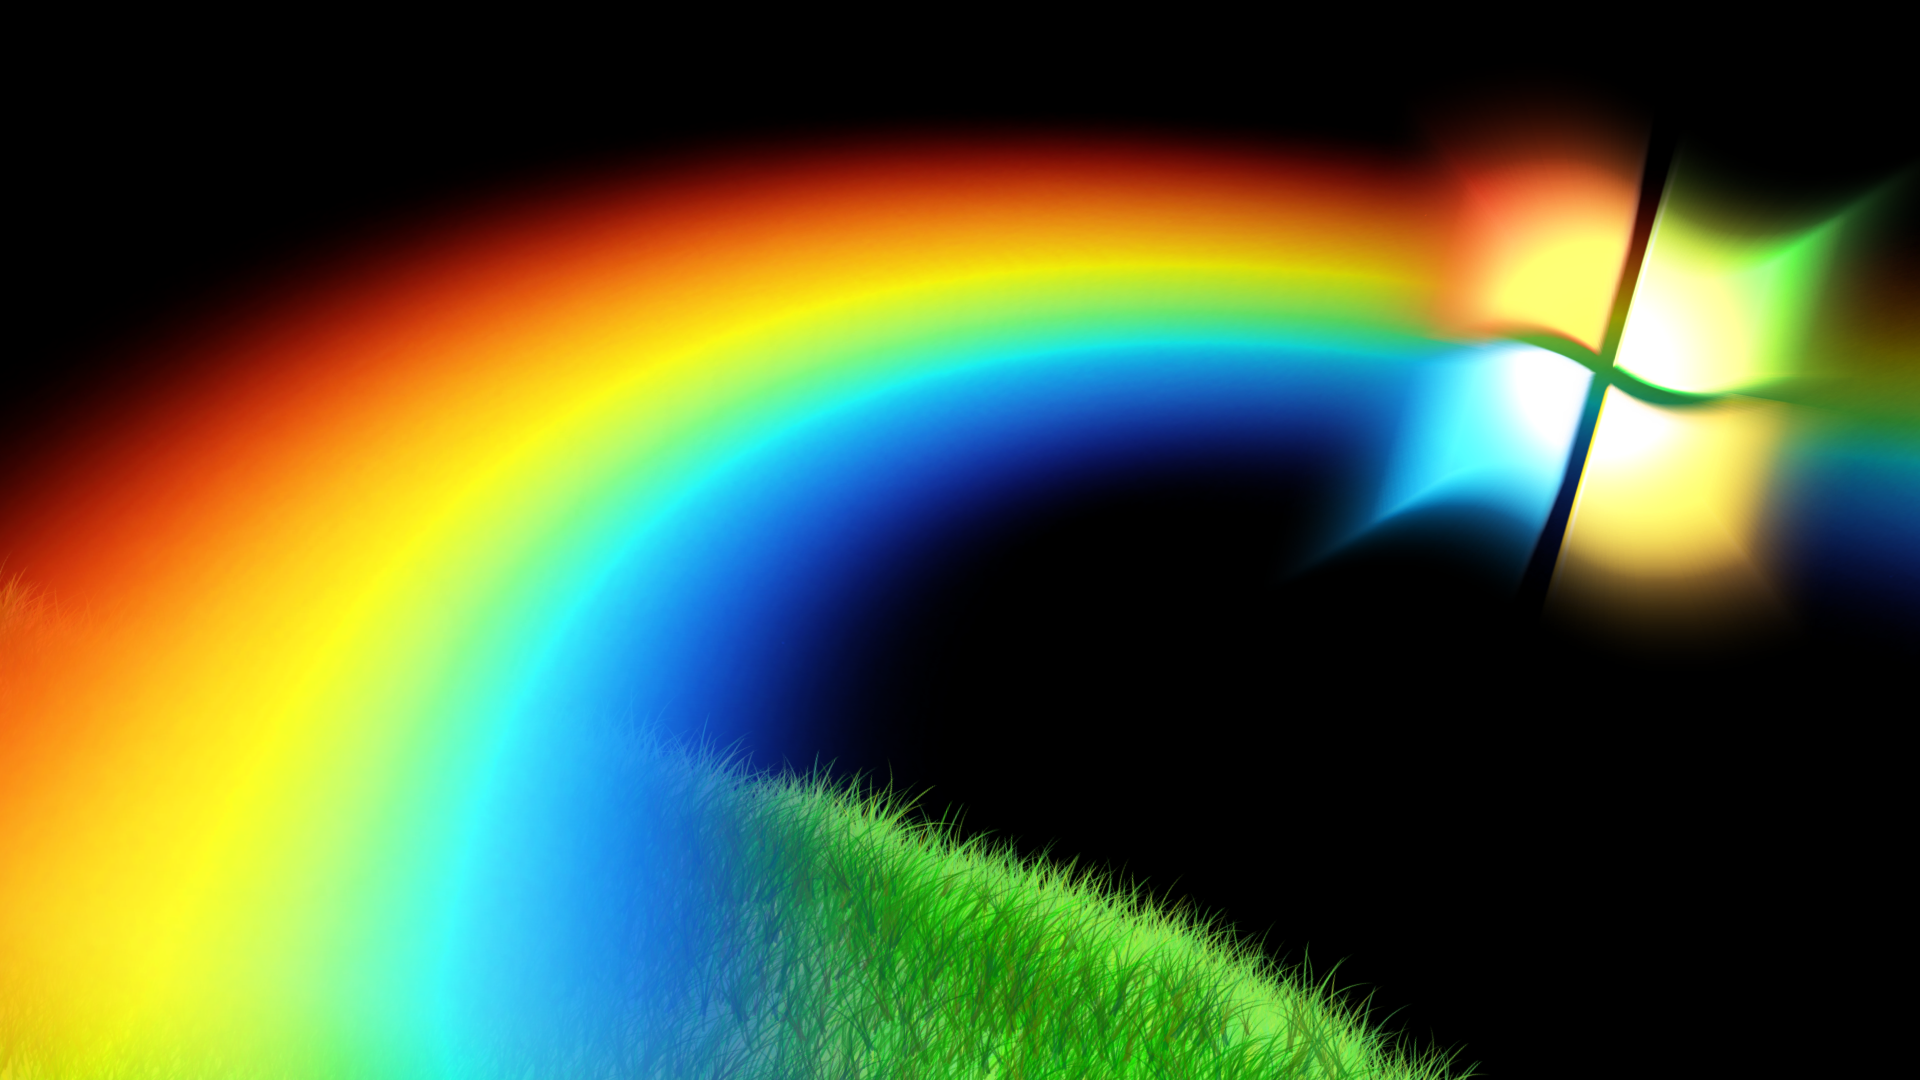 HD Rainbow Wallpaper